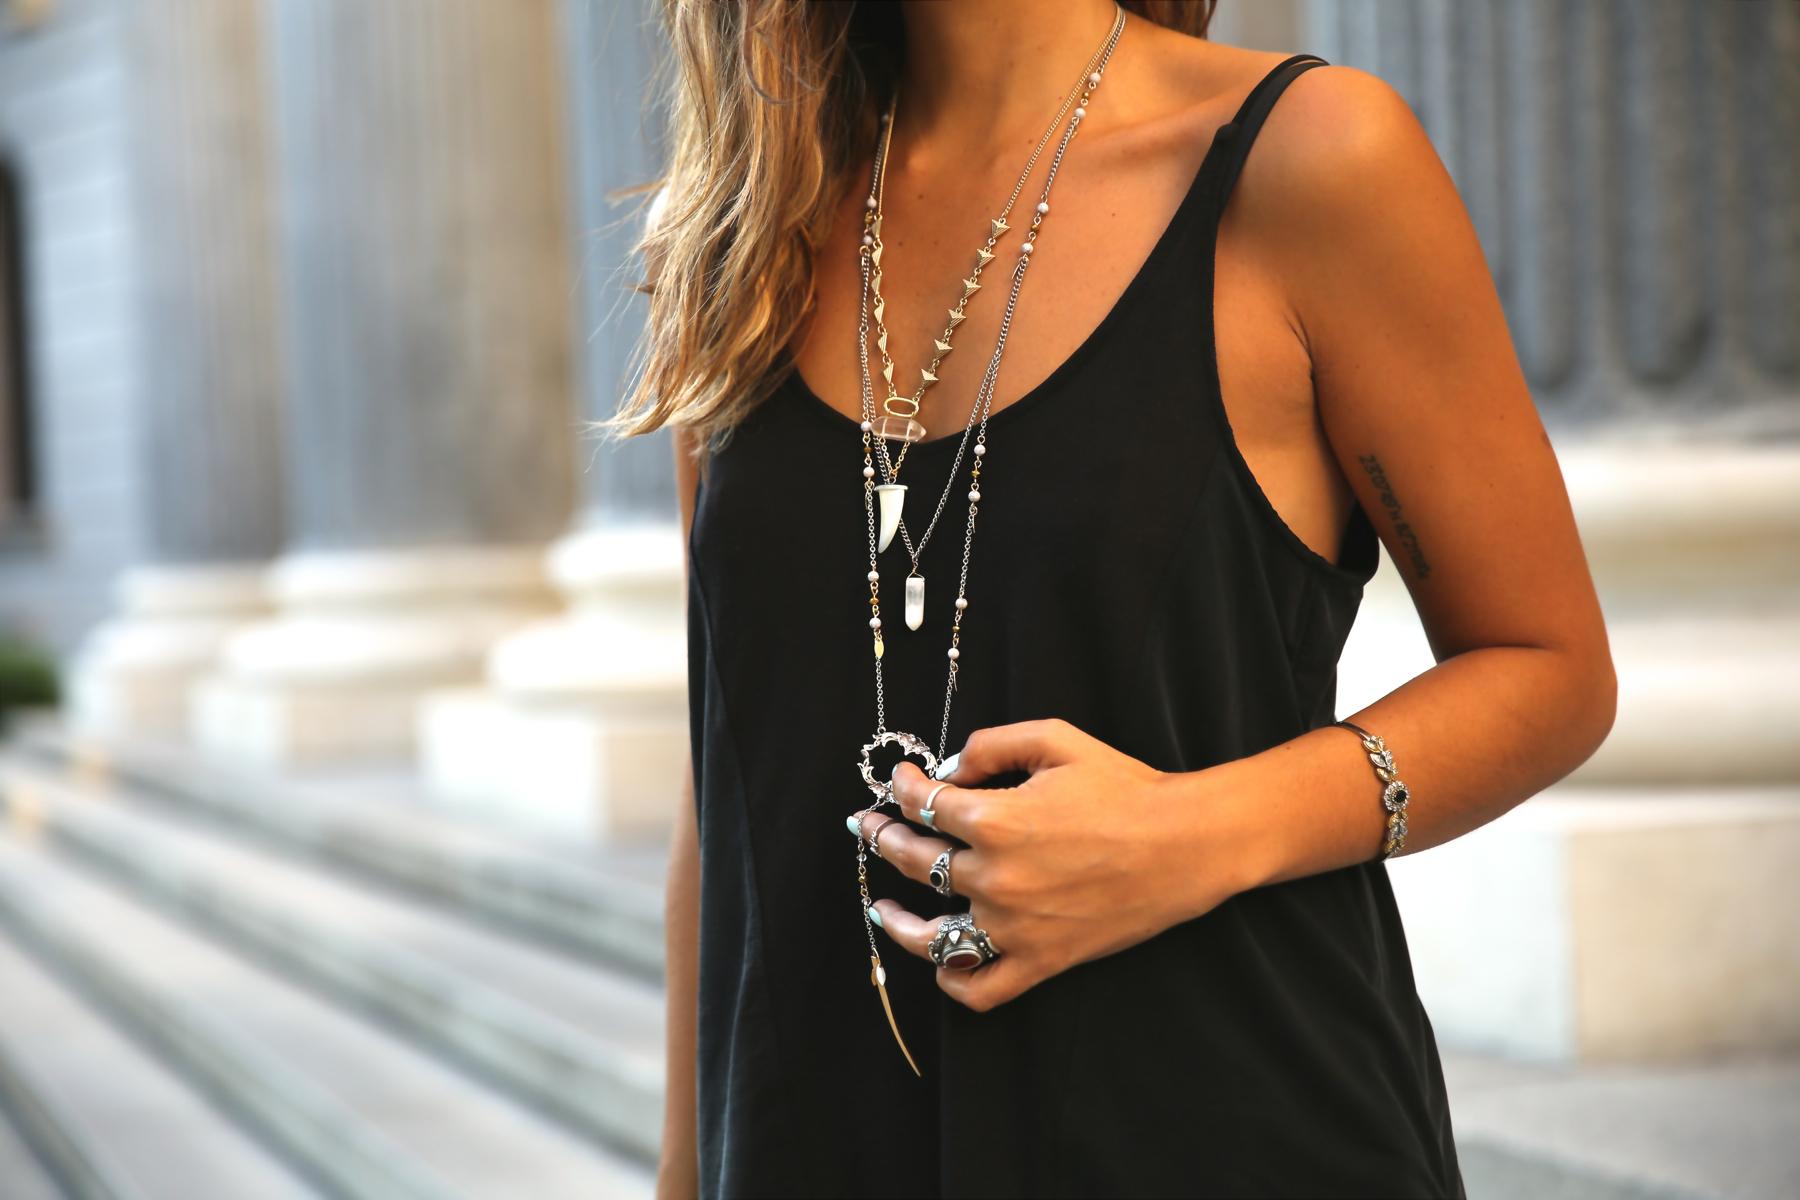 trendy_taste-look-outfit-street_style-ootd-blog-blogger-fashion_spain-moda_españa-animal_print-boho-casual-falda-skirt-black_booties-botines_negros-jeffrey_campbell-zara-bolso_flecos-vintage-1